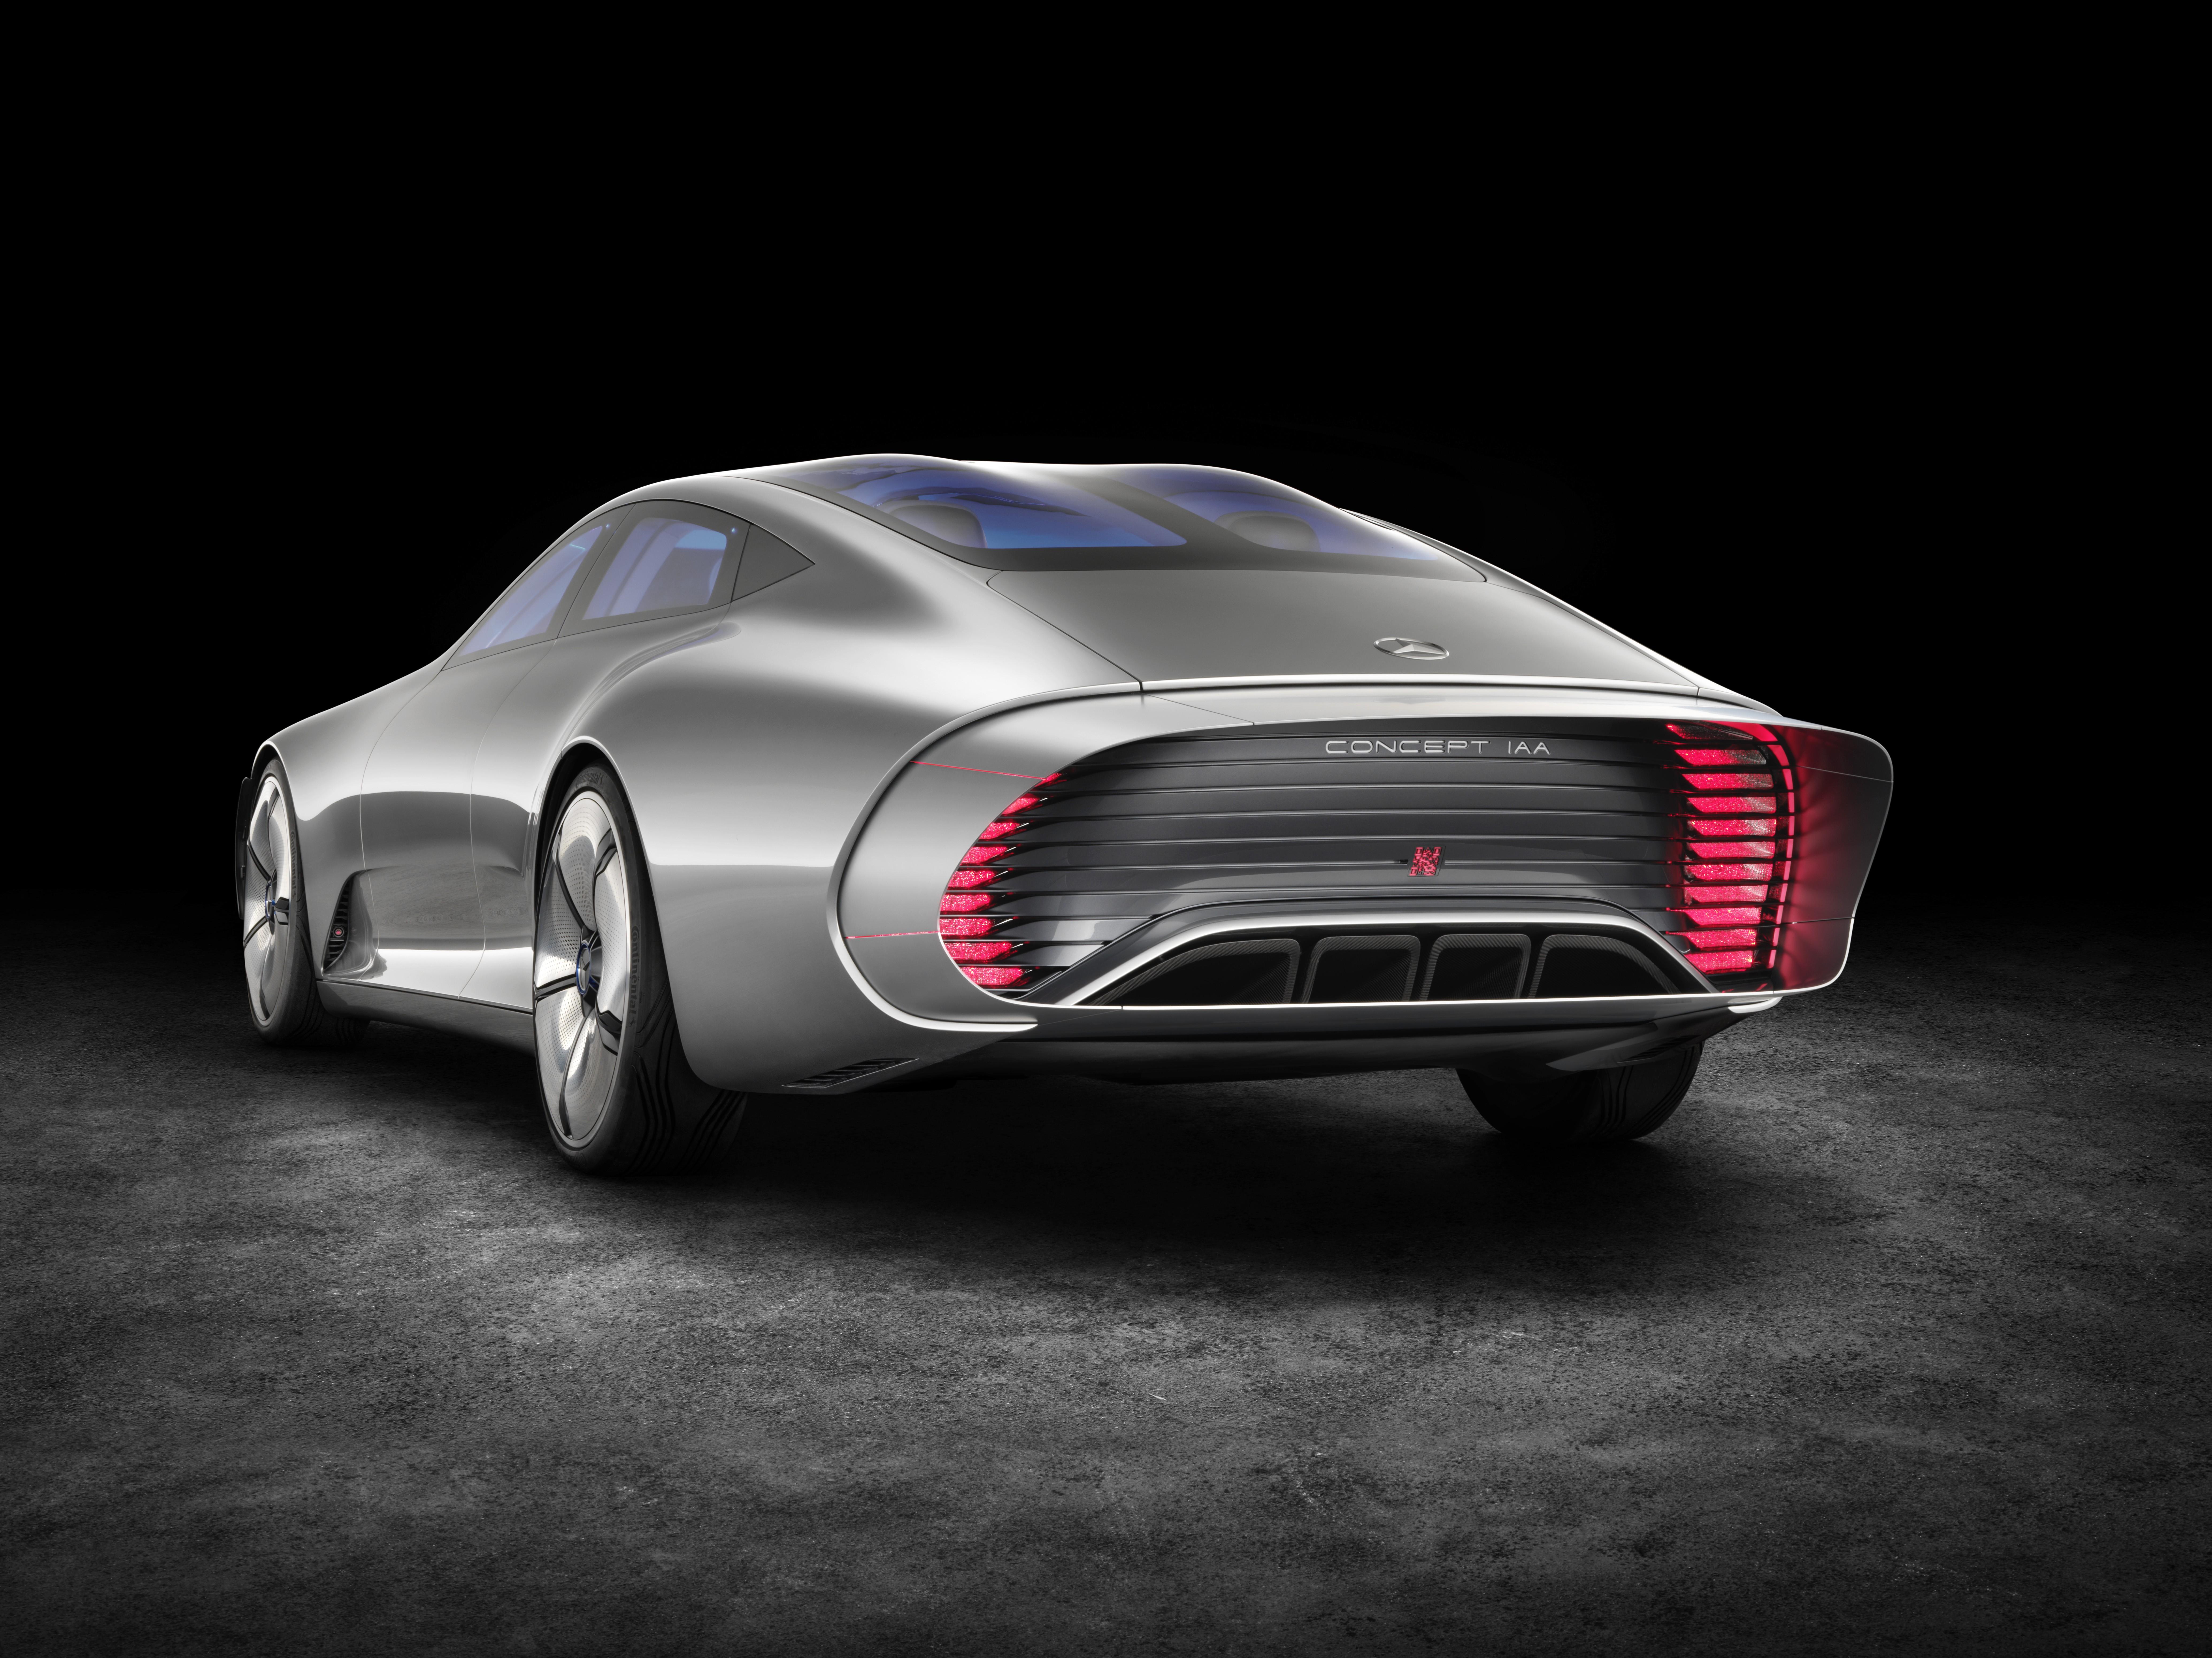 https://s1.cdn.autoevolution.com/images/news/gallery/mercedes-amg-sedan-concept-confirmed-for-2017-geneva-motor-show-debut_3.jpg